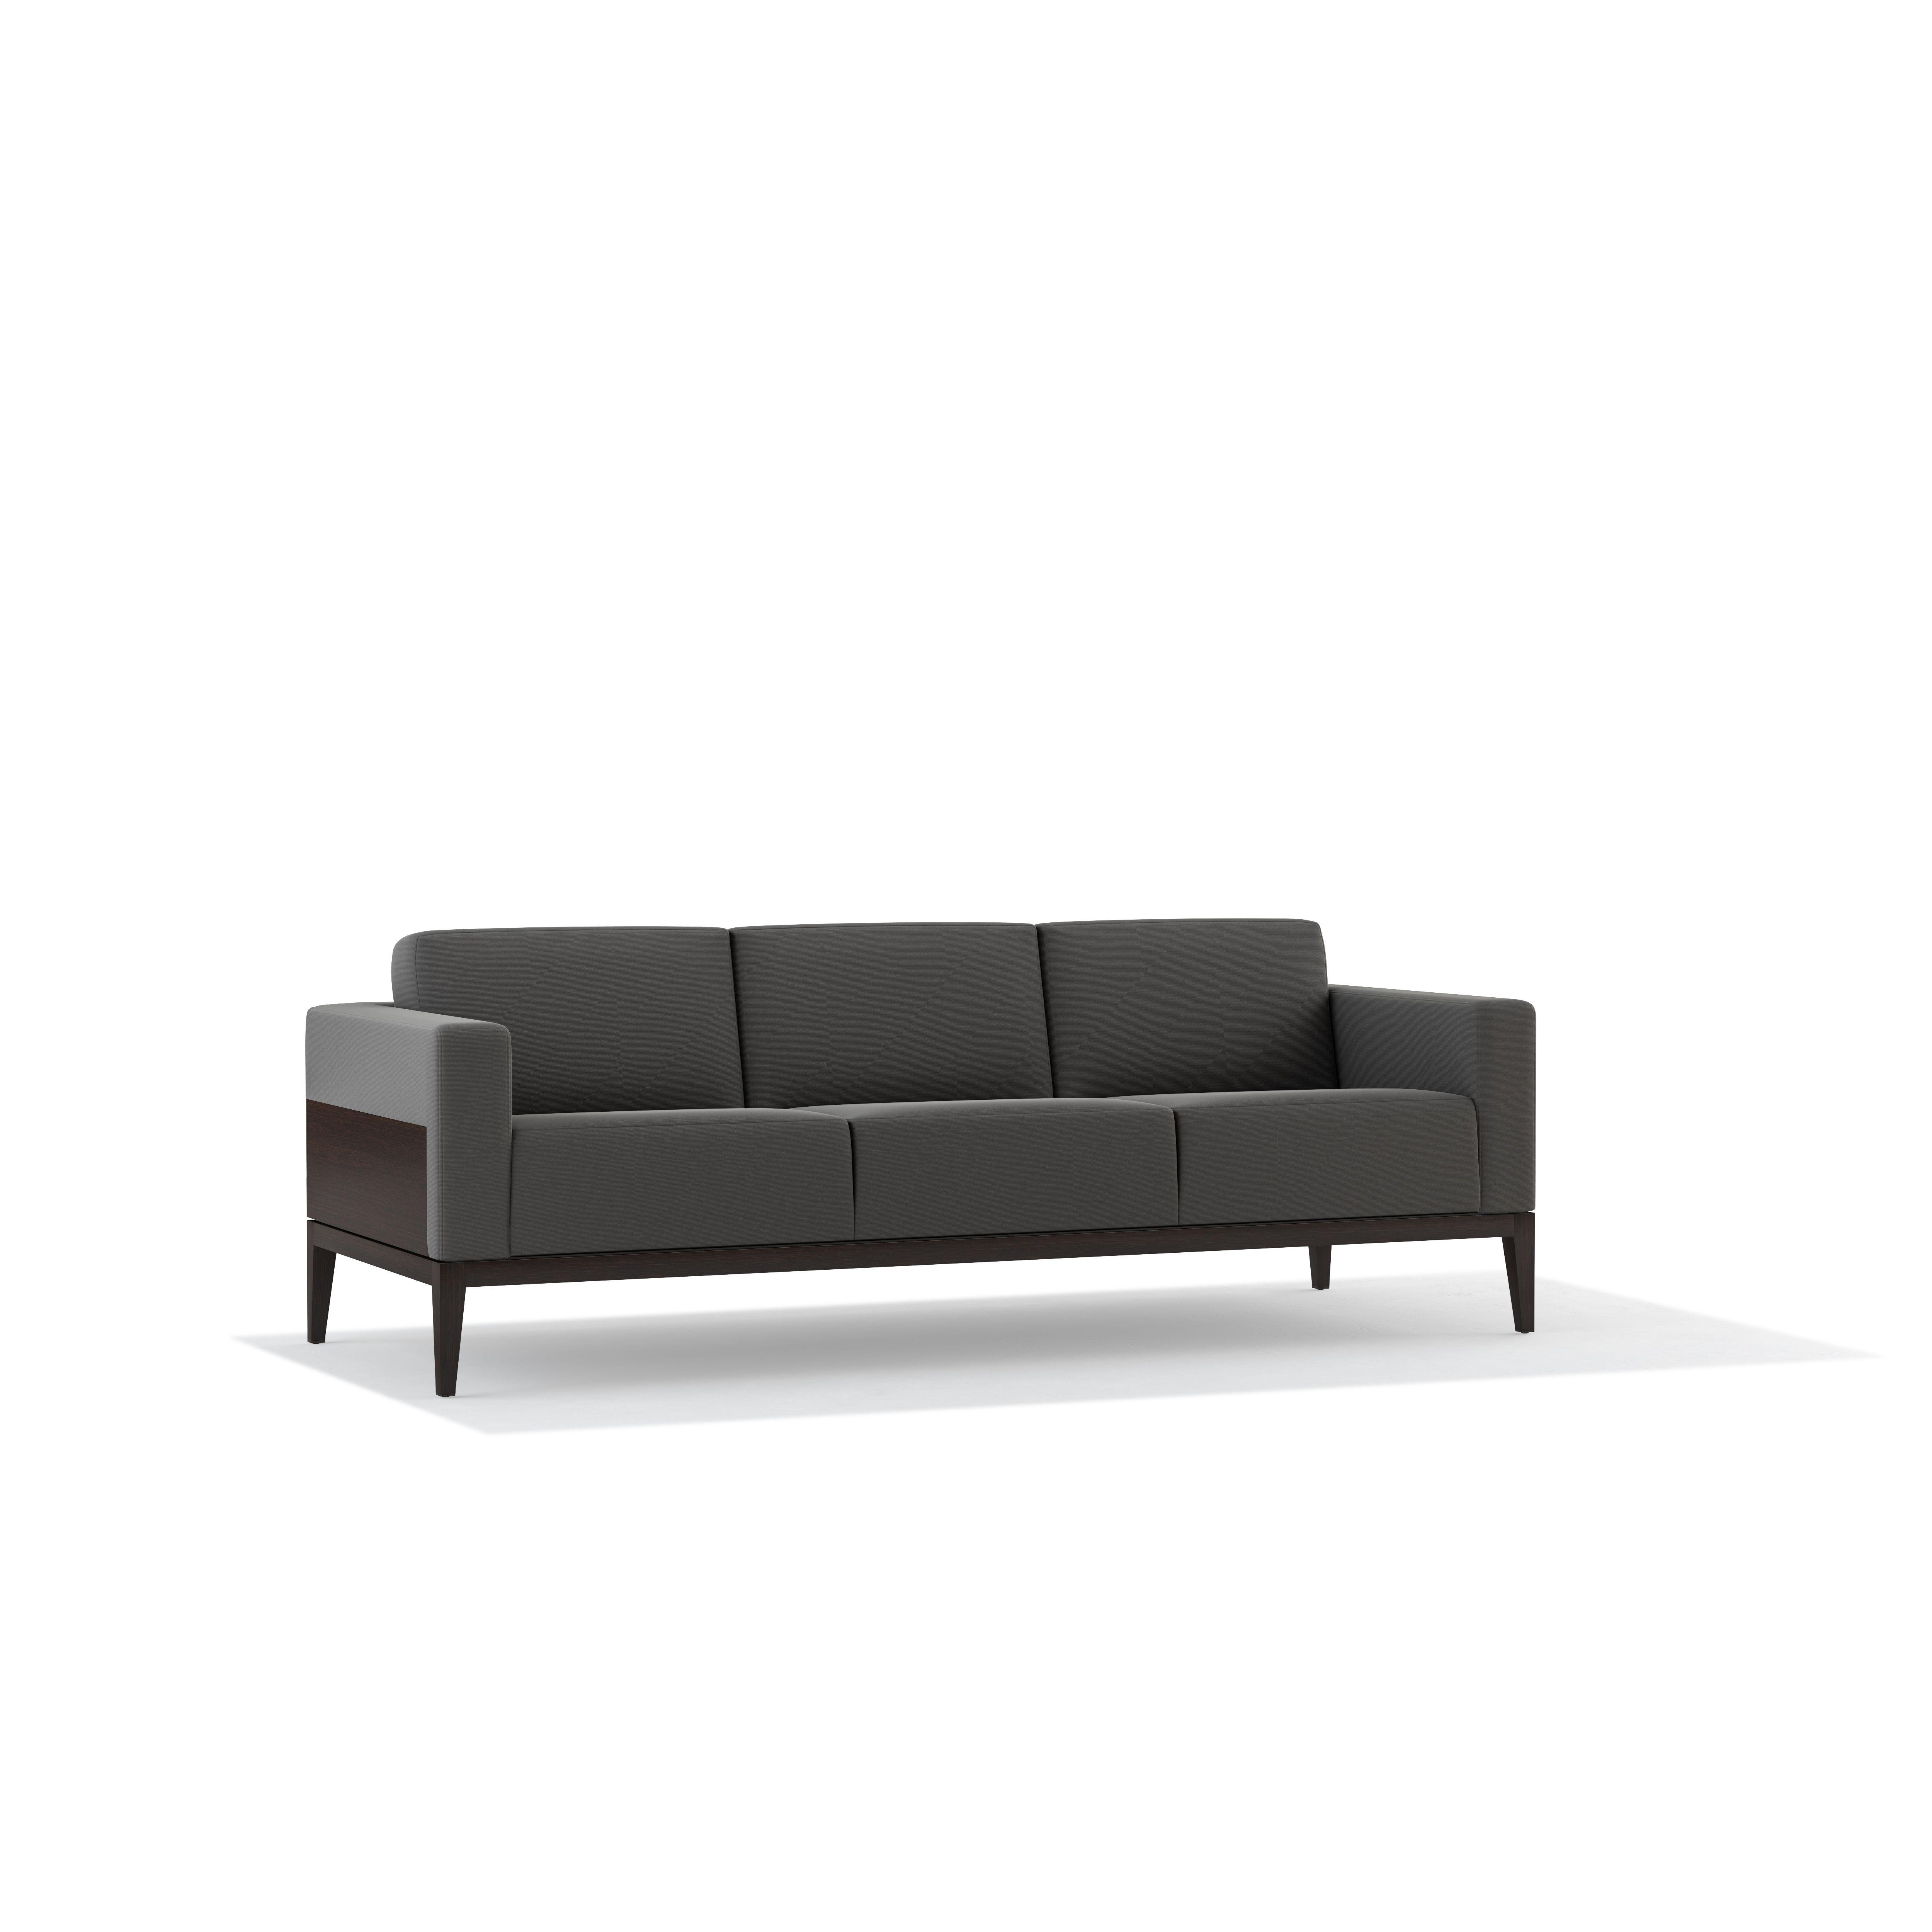 Alia Wood Sofa Wood Surround - Cumberland Furniture   Wood ...